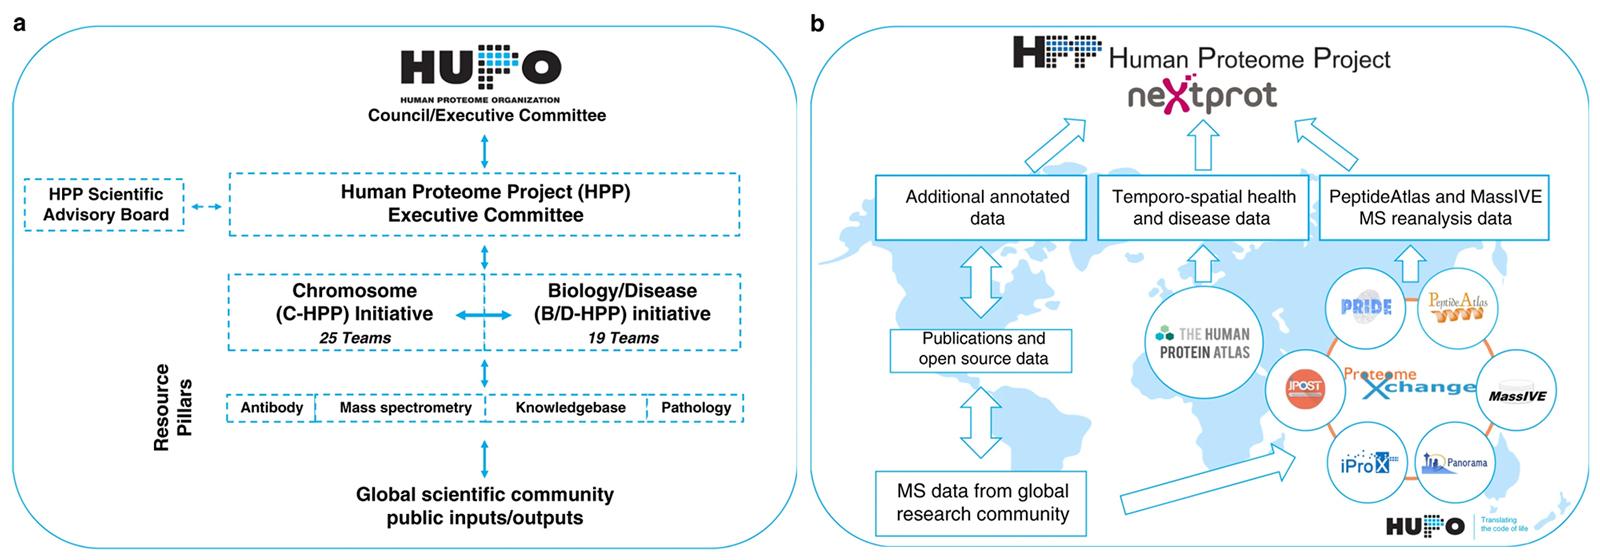 Architecture du Human Proteome Project